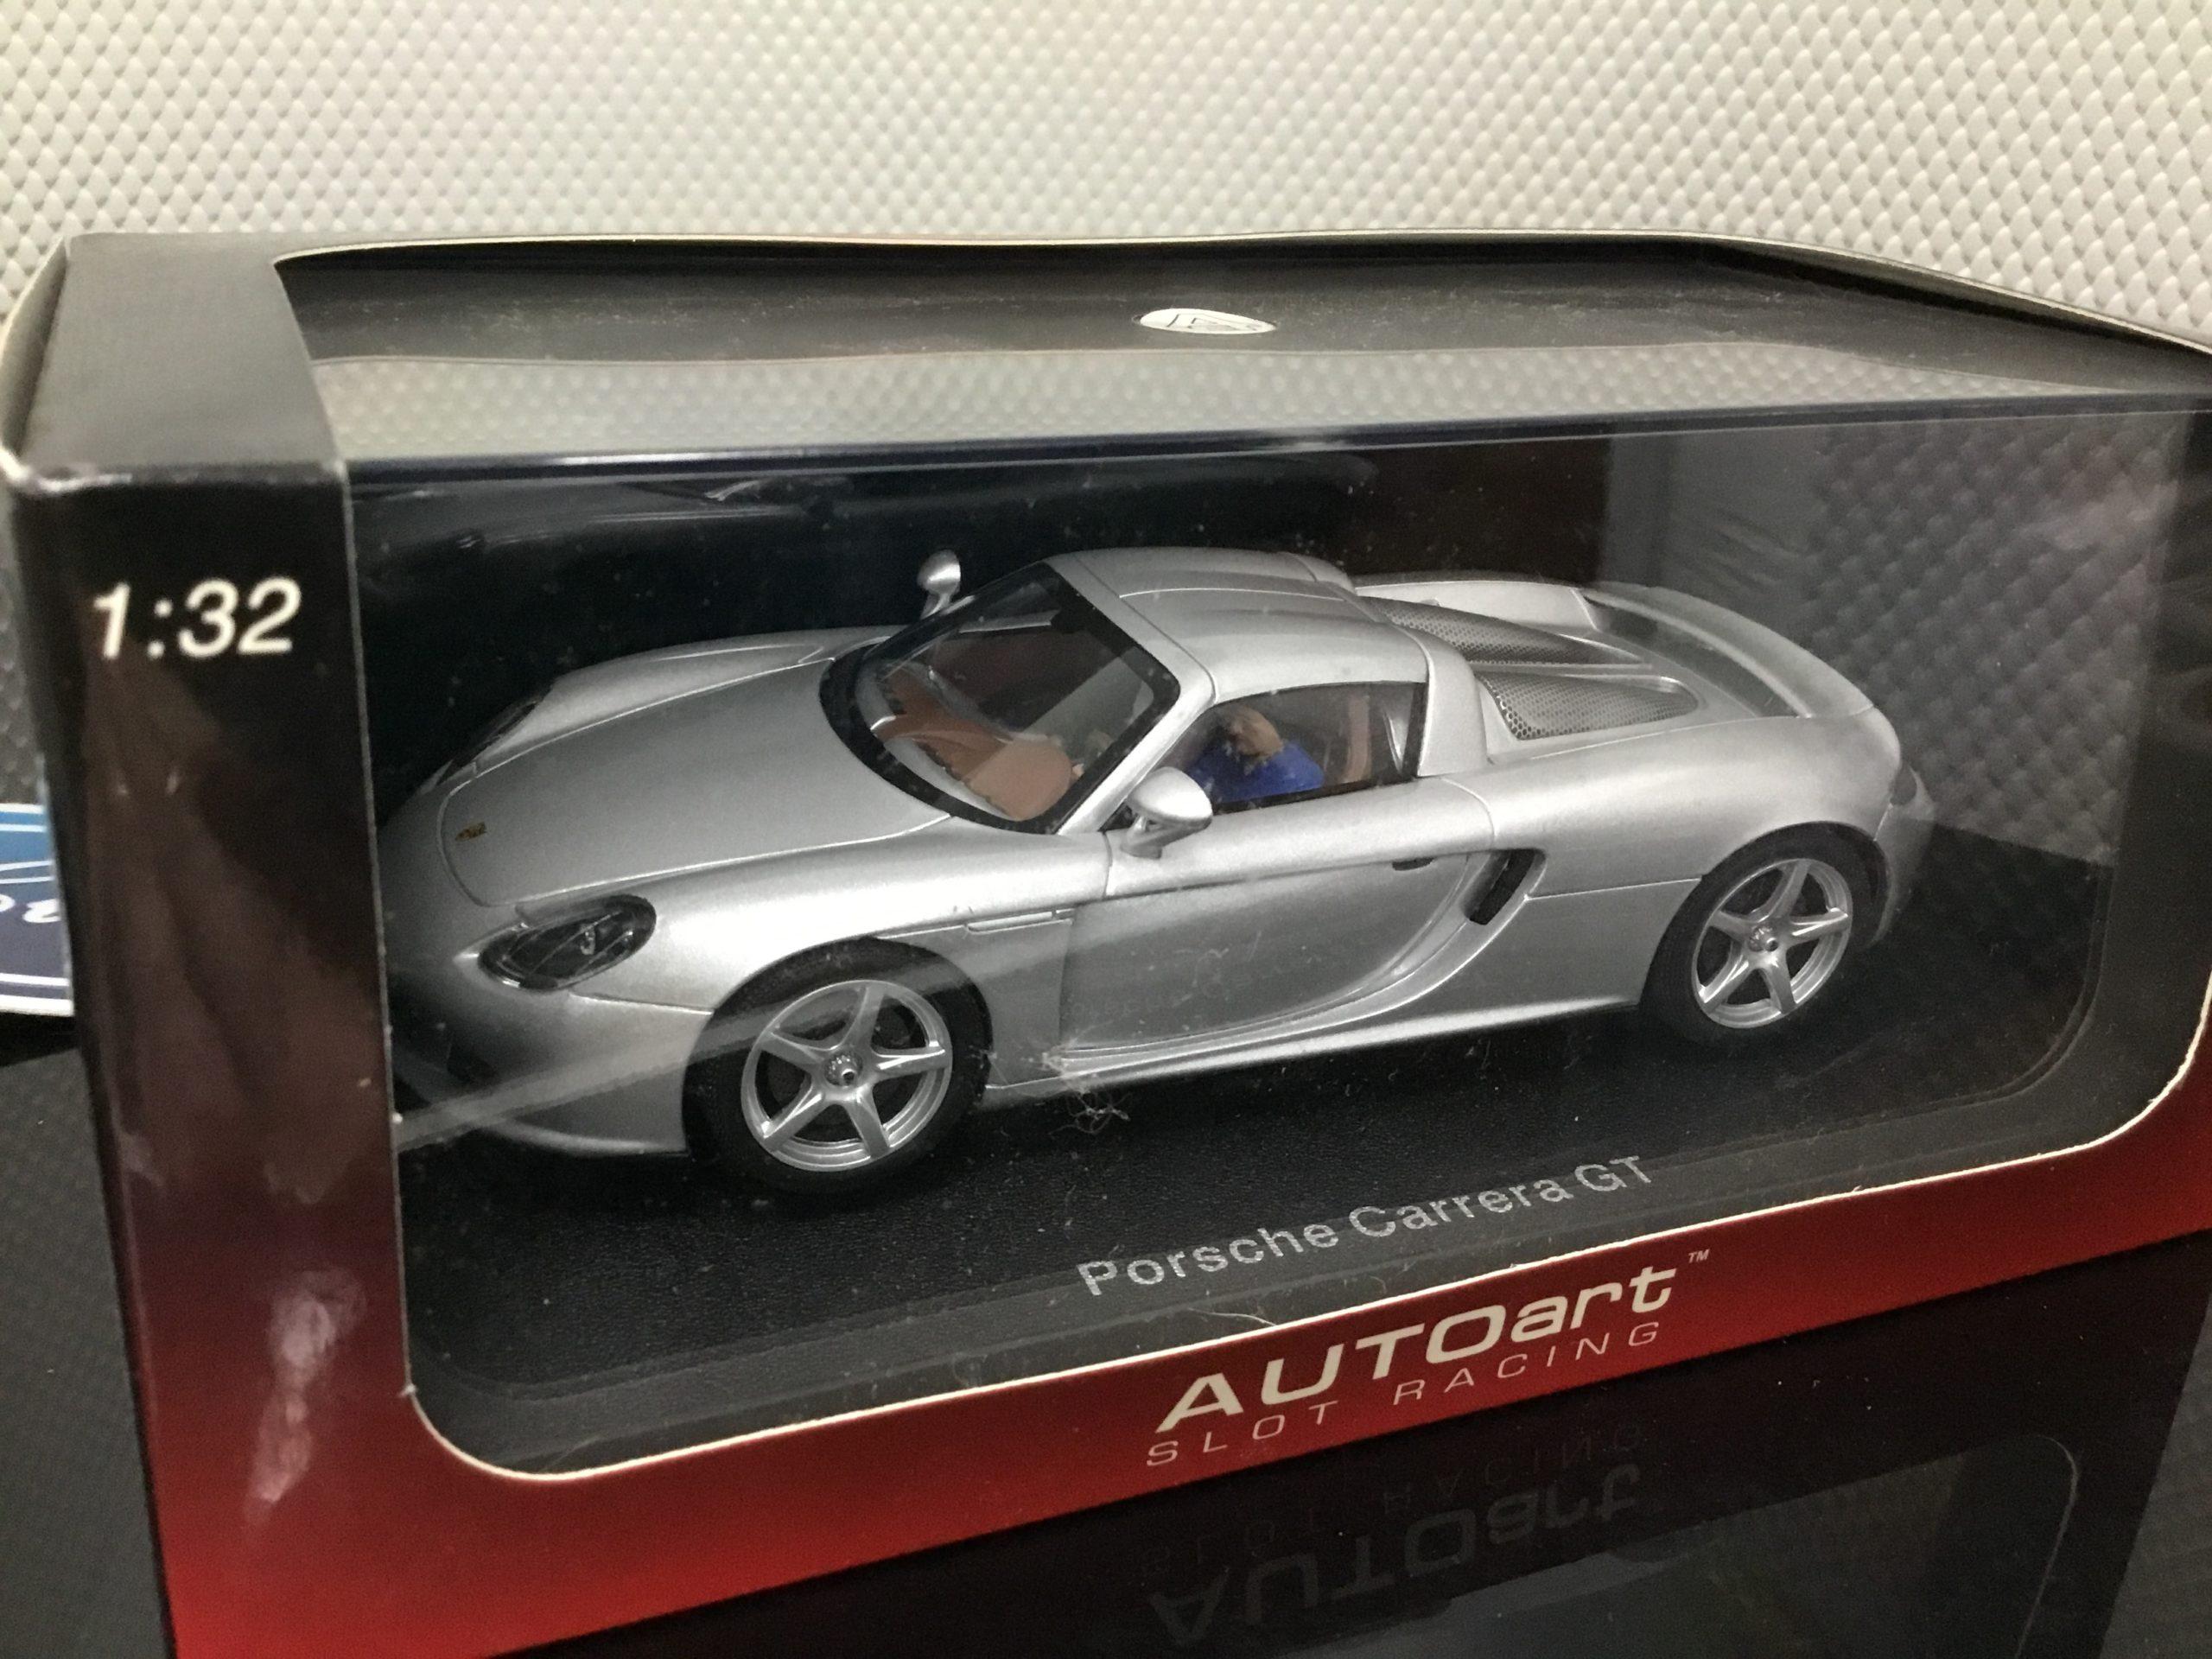 AutoArt 13191 Porsche Carrera Silver 1/32 Slot Car.